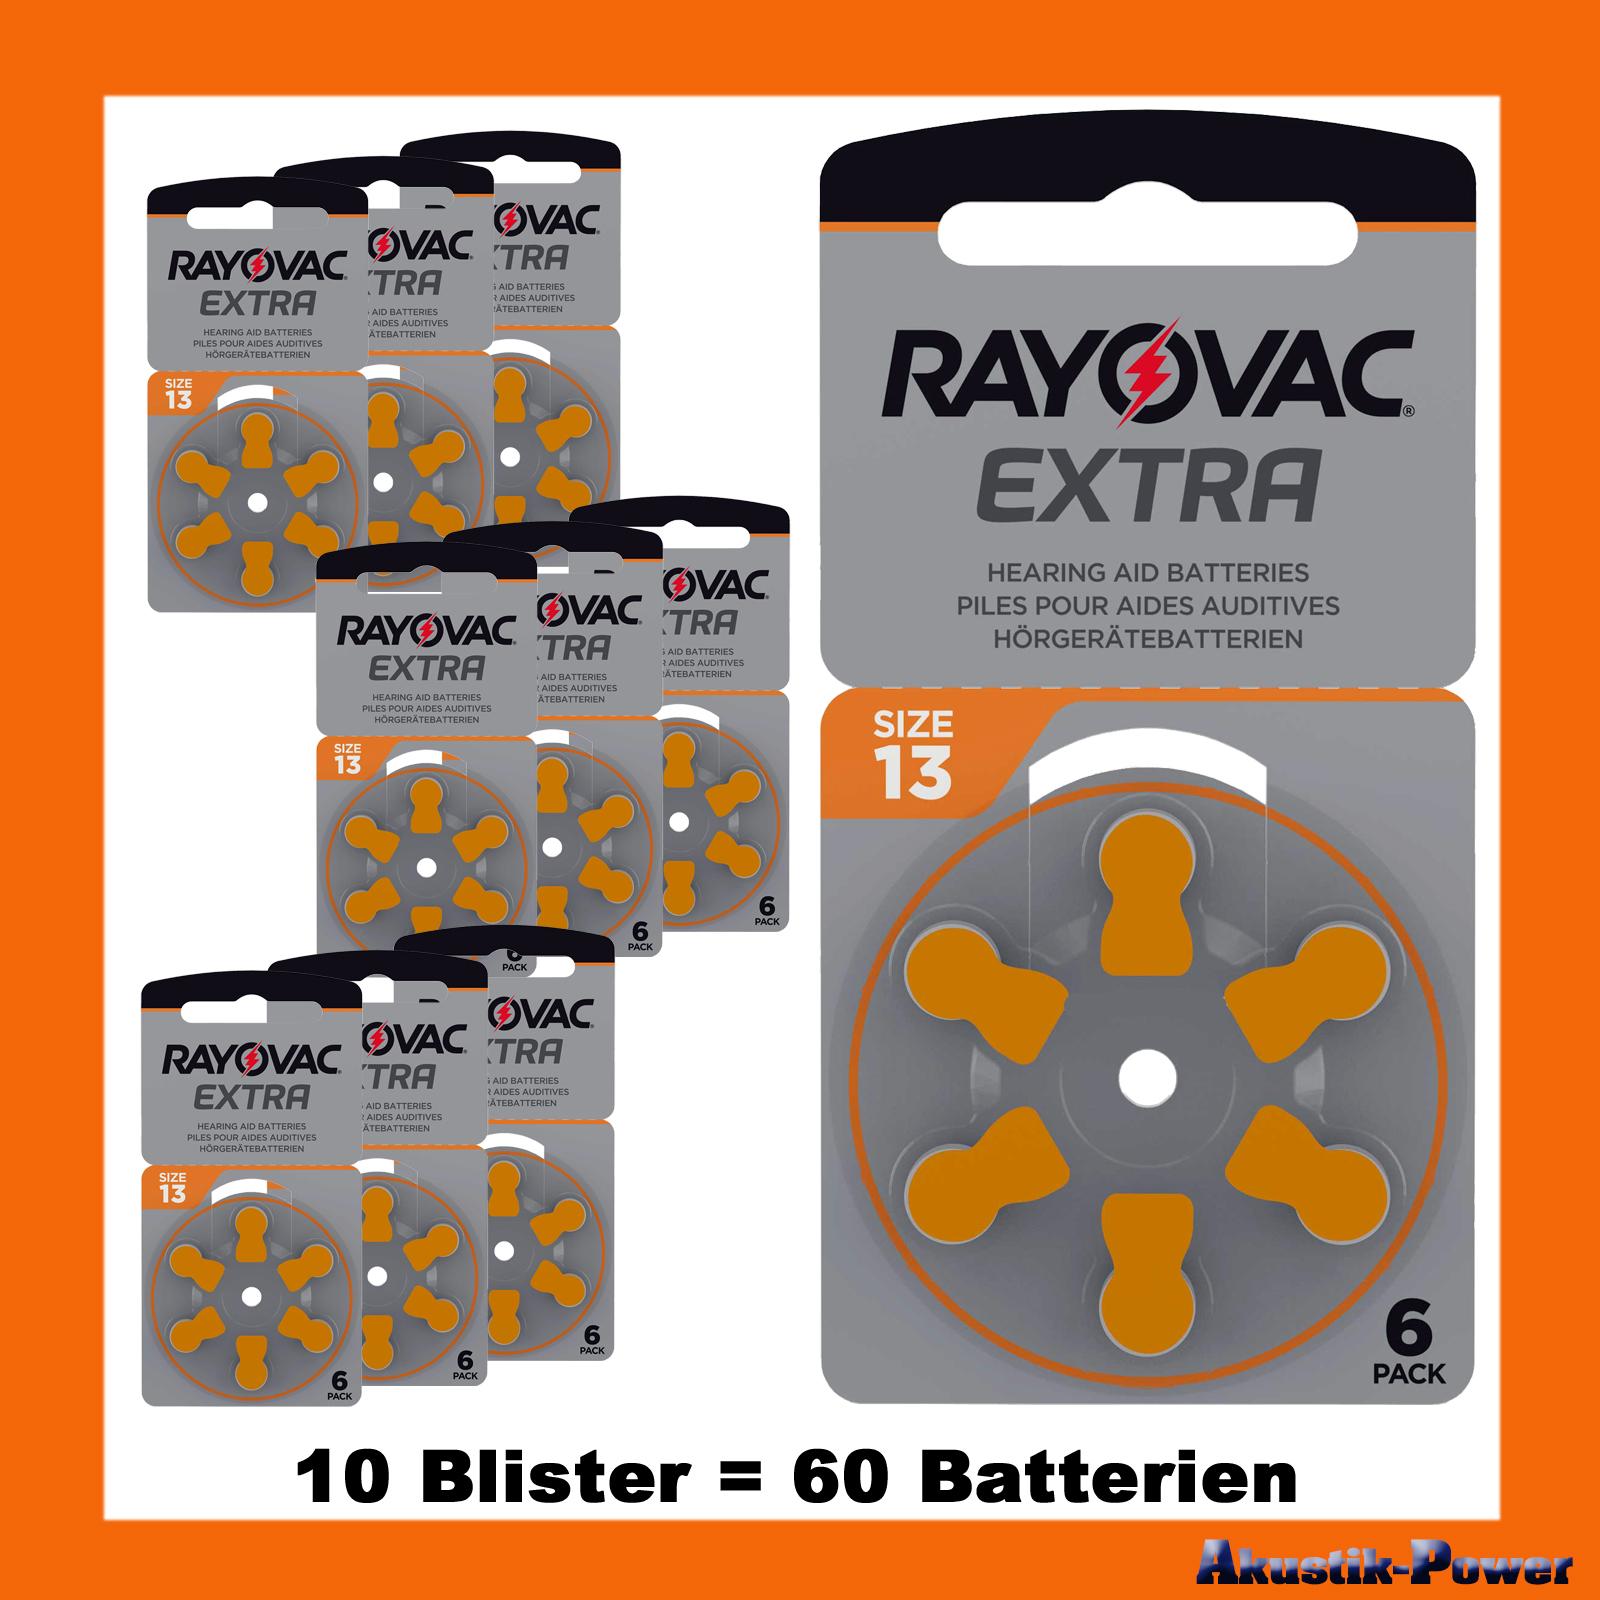 akustik power rayovac typ 13 pr48 h rger te batterien 60 batterien 20 99 online kaufen. Black Bedroom Furniture Sets. Home Design Ideas